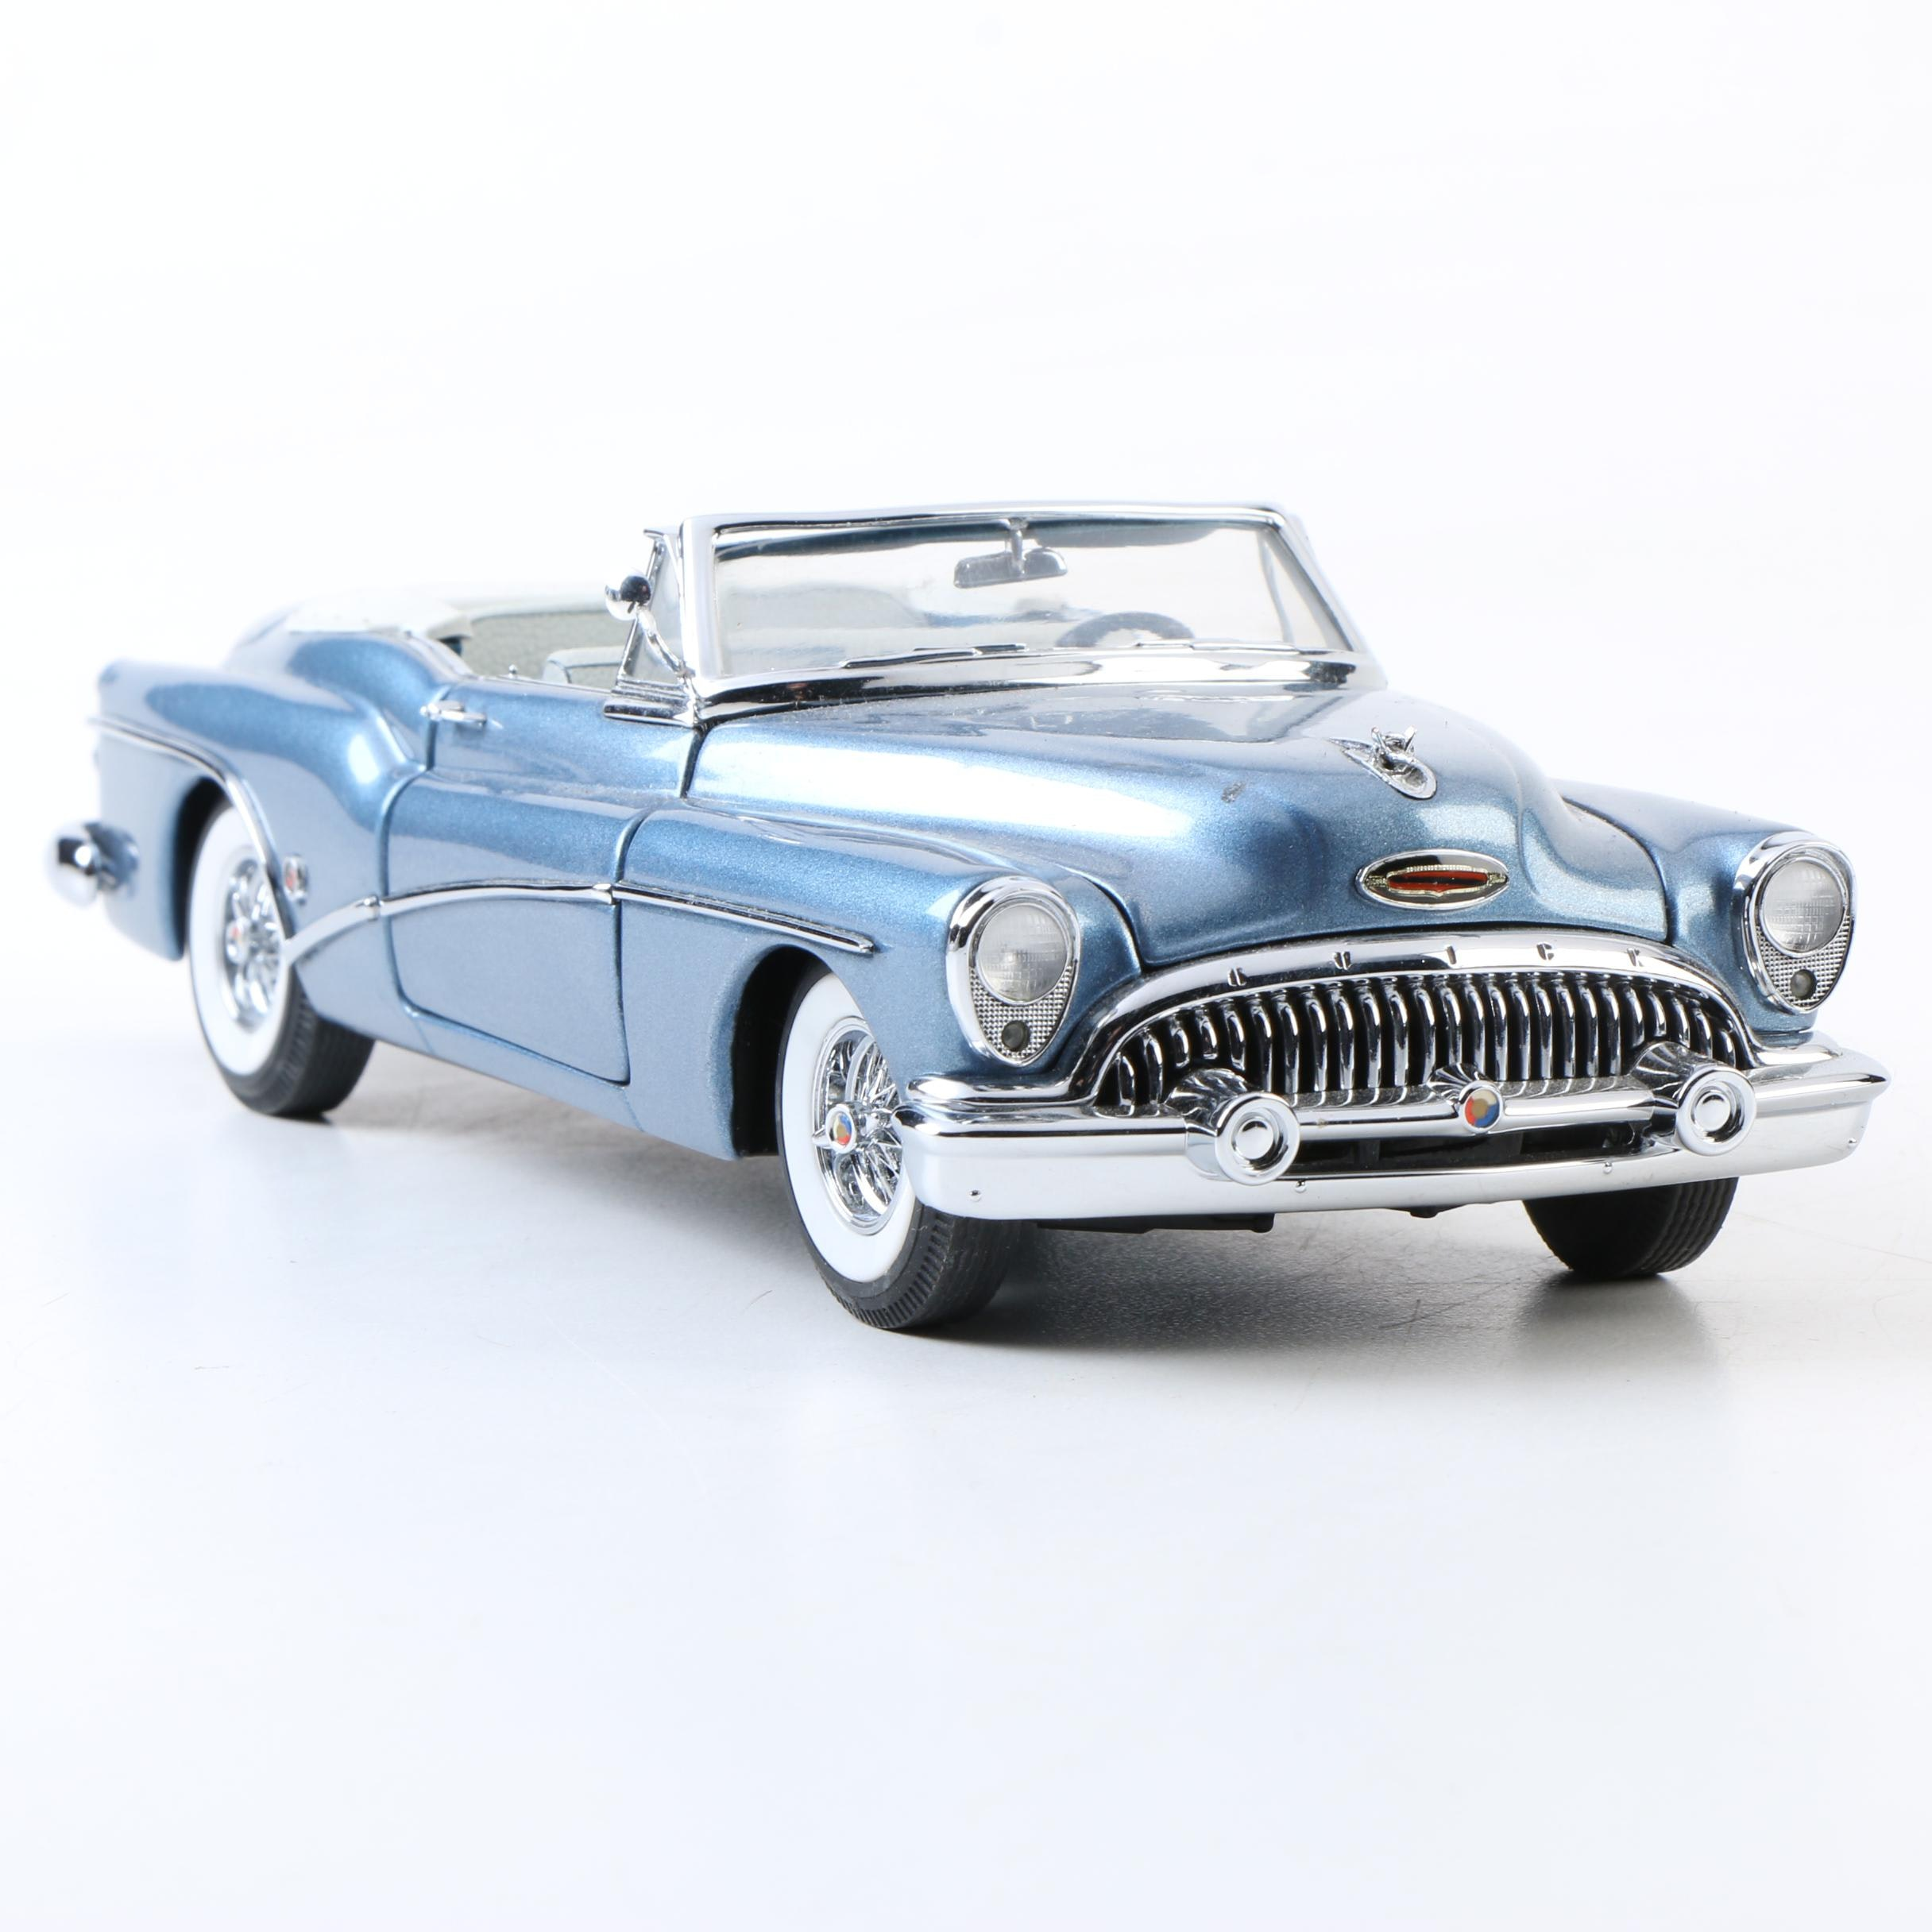 1953 Buick Skylark by The Danbury Mint